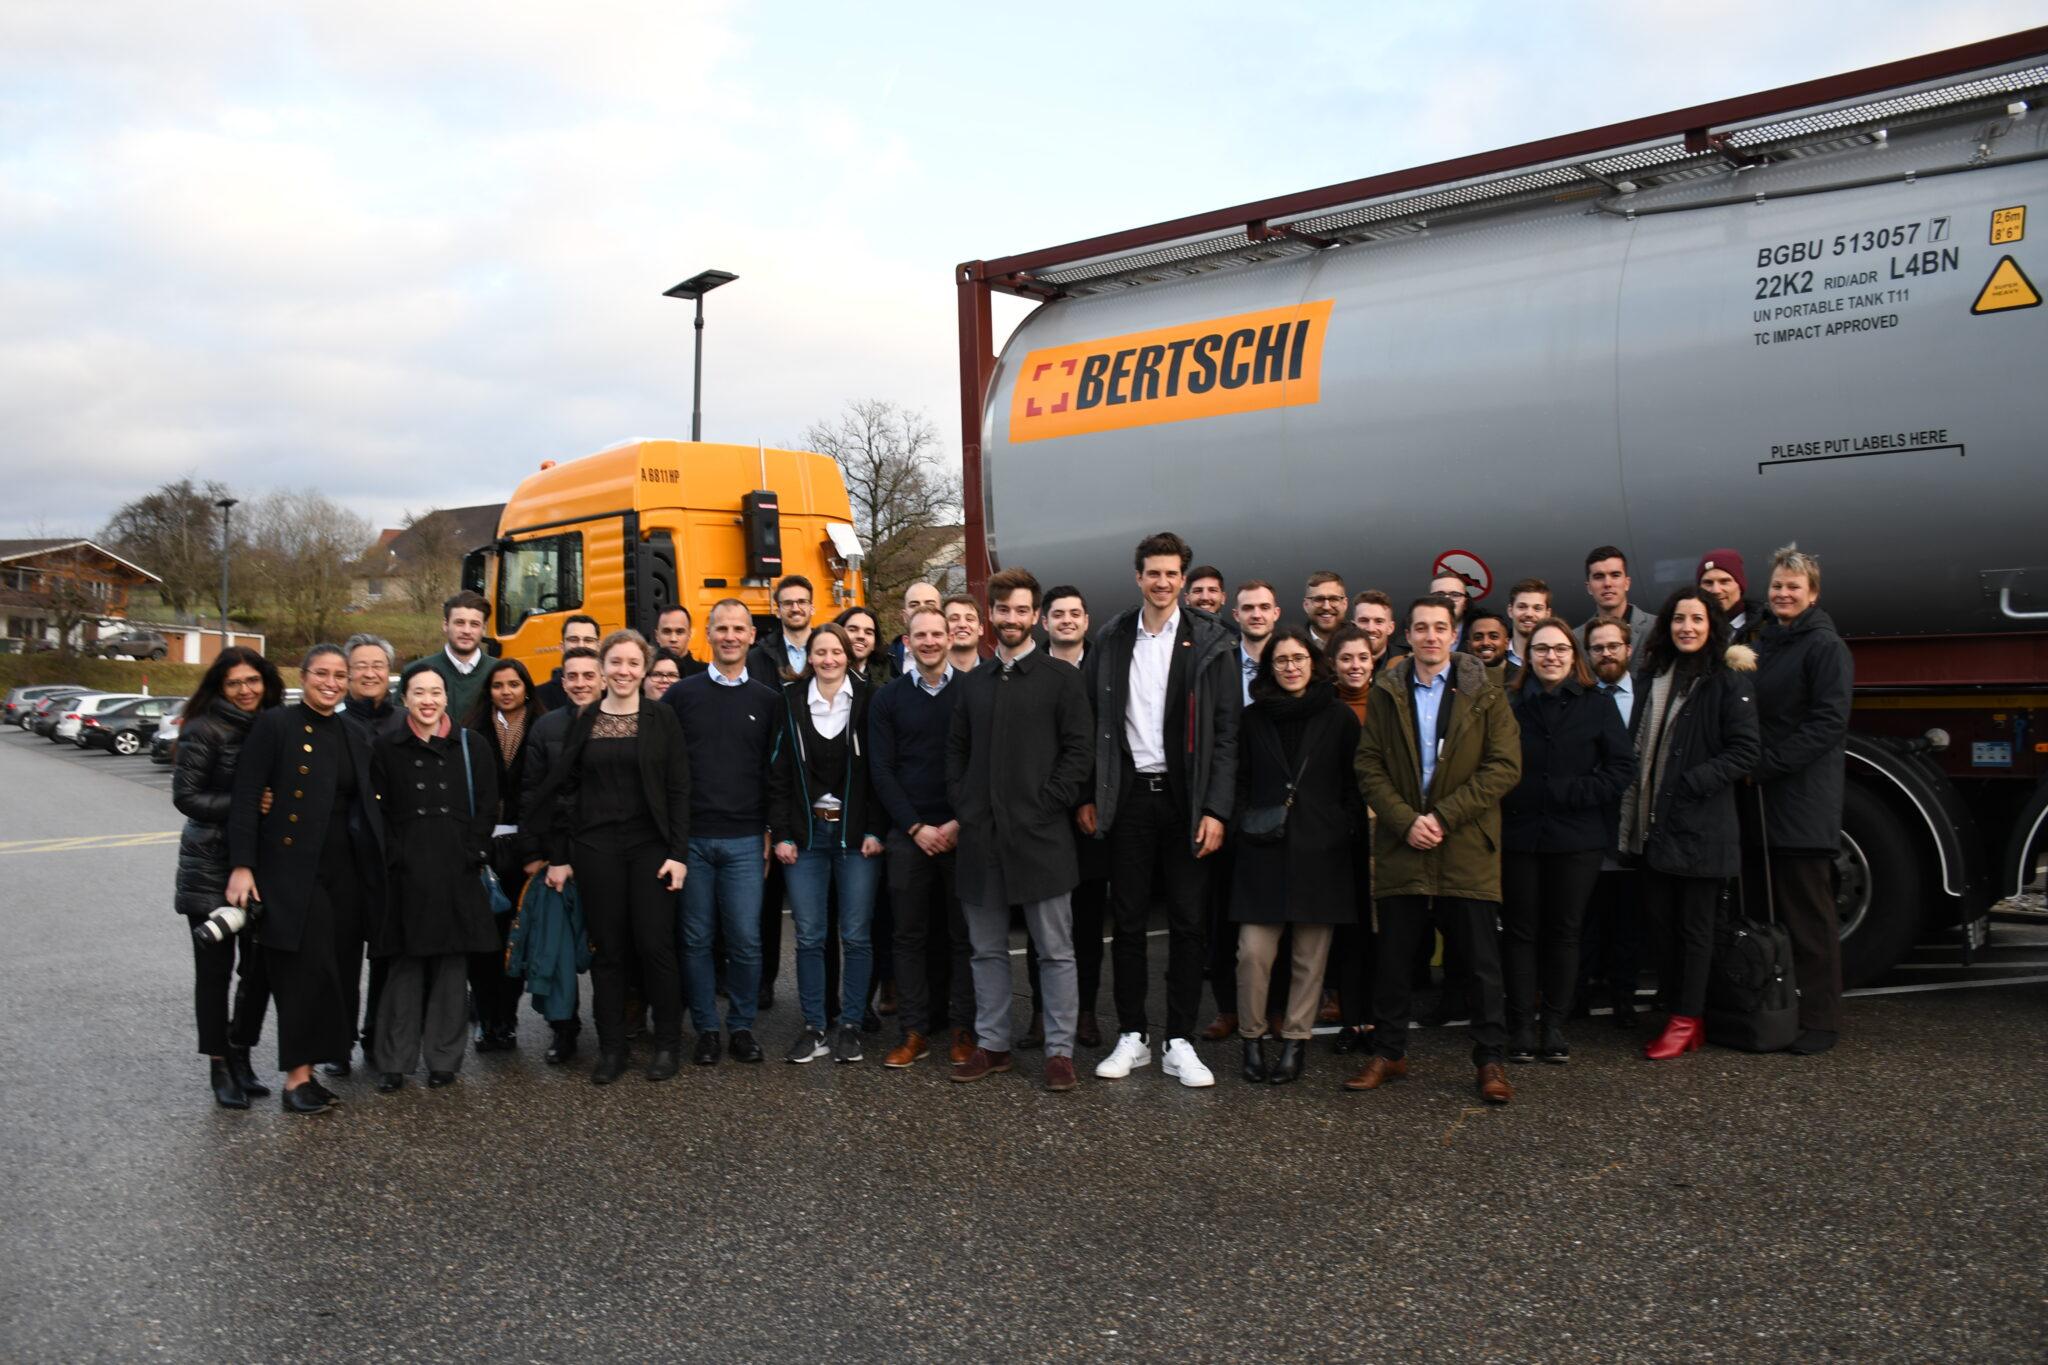 Preparatory Seminar 2020, Day 3 – Visiting Hoffmann-La Roche & Bertschi AG